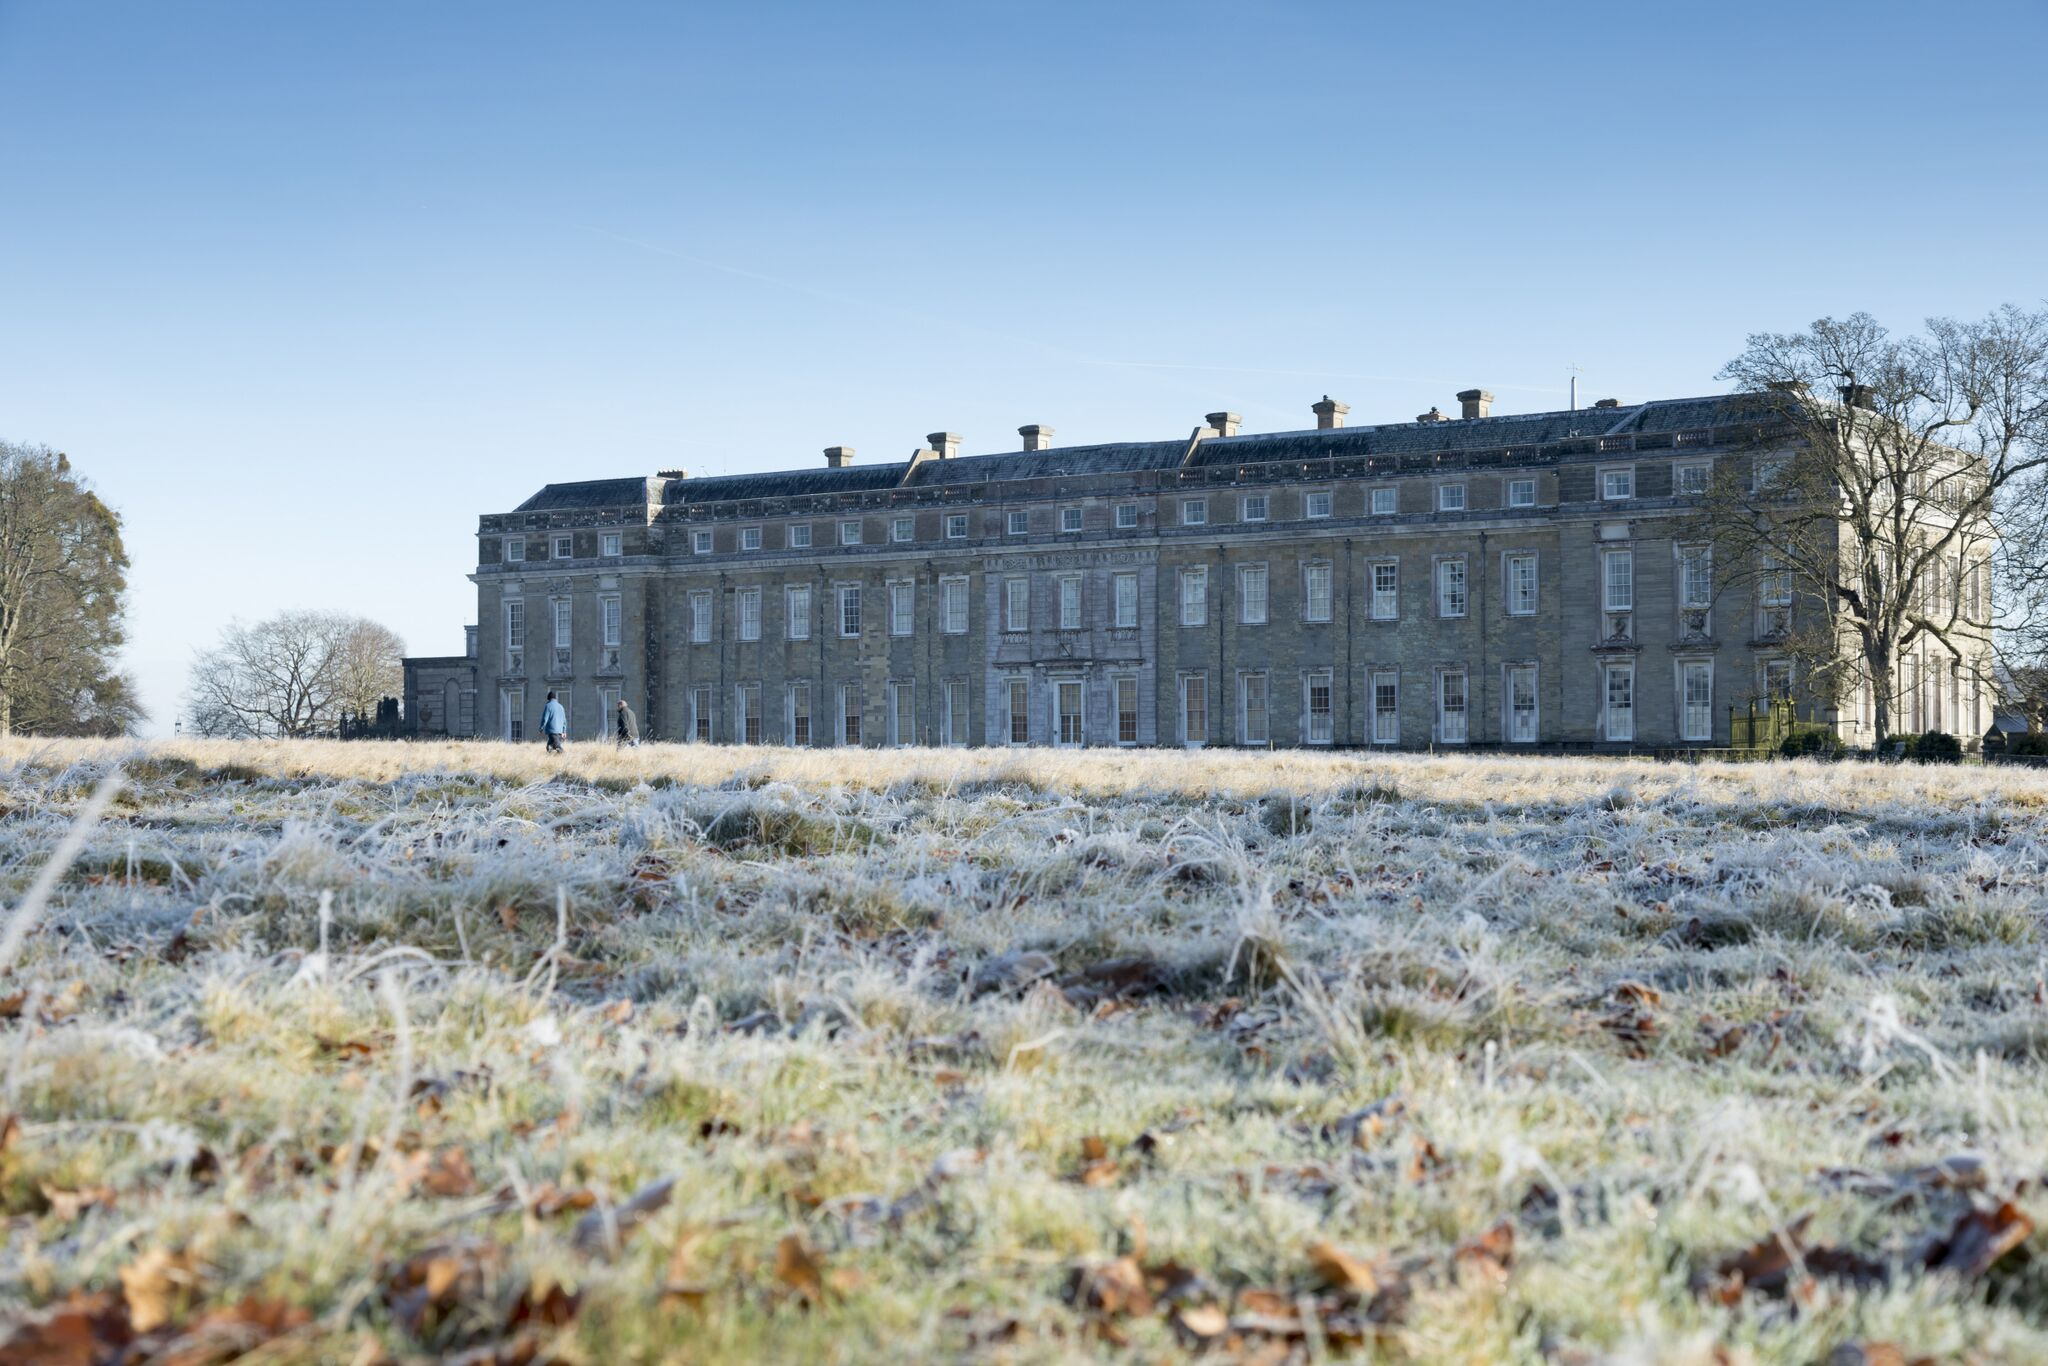 National Trust Images_John Miller 2_preview.jpeg